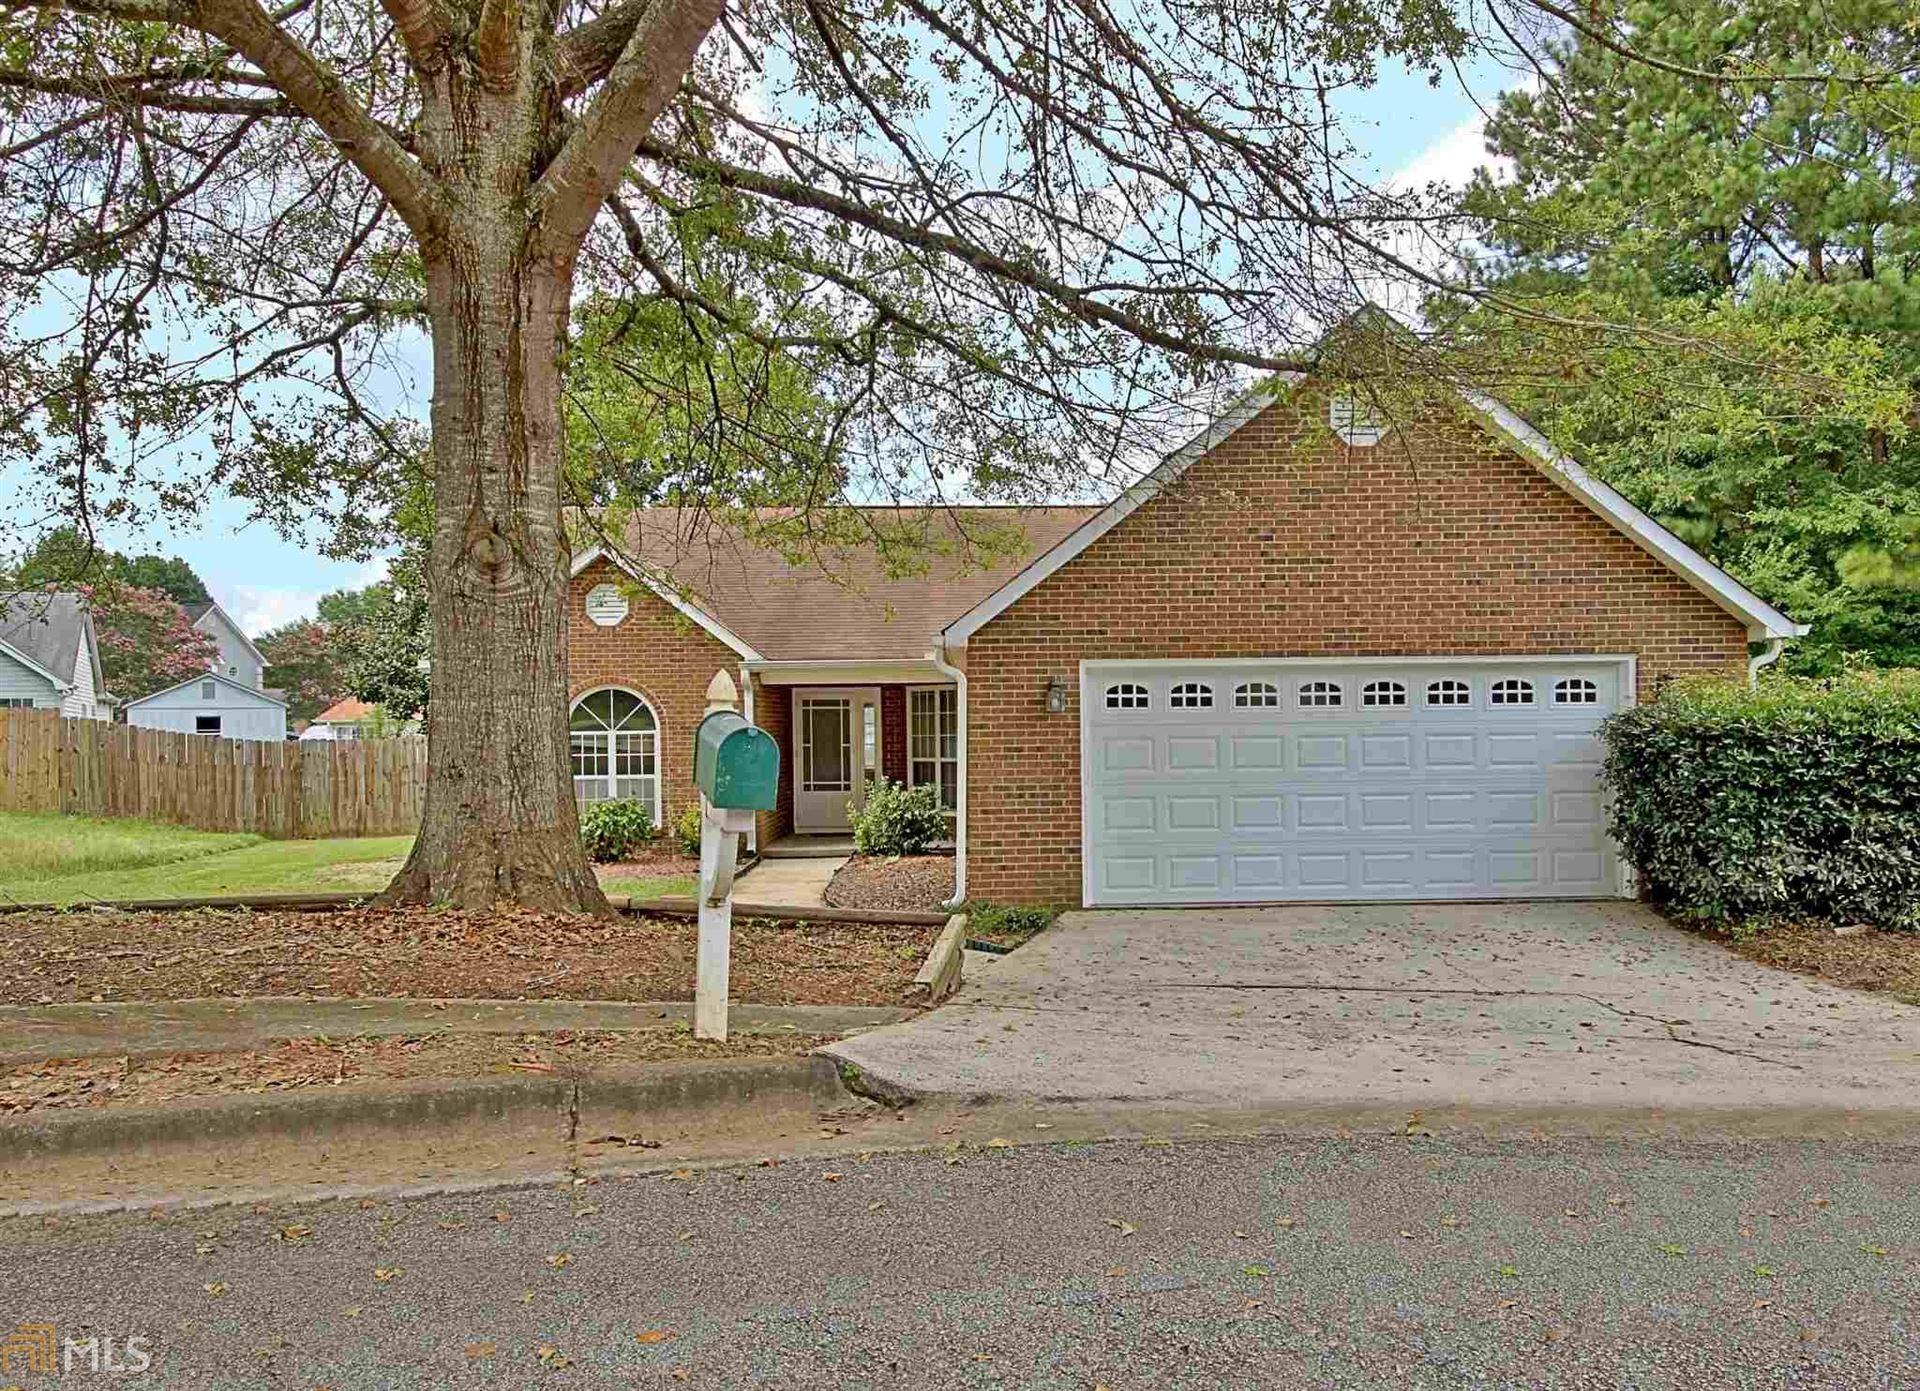 120 Gingerbread Pl, Fayetteville, GA 30214 - #: 8826128